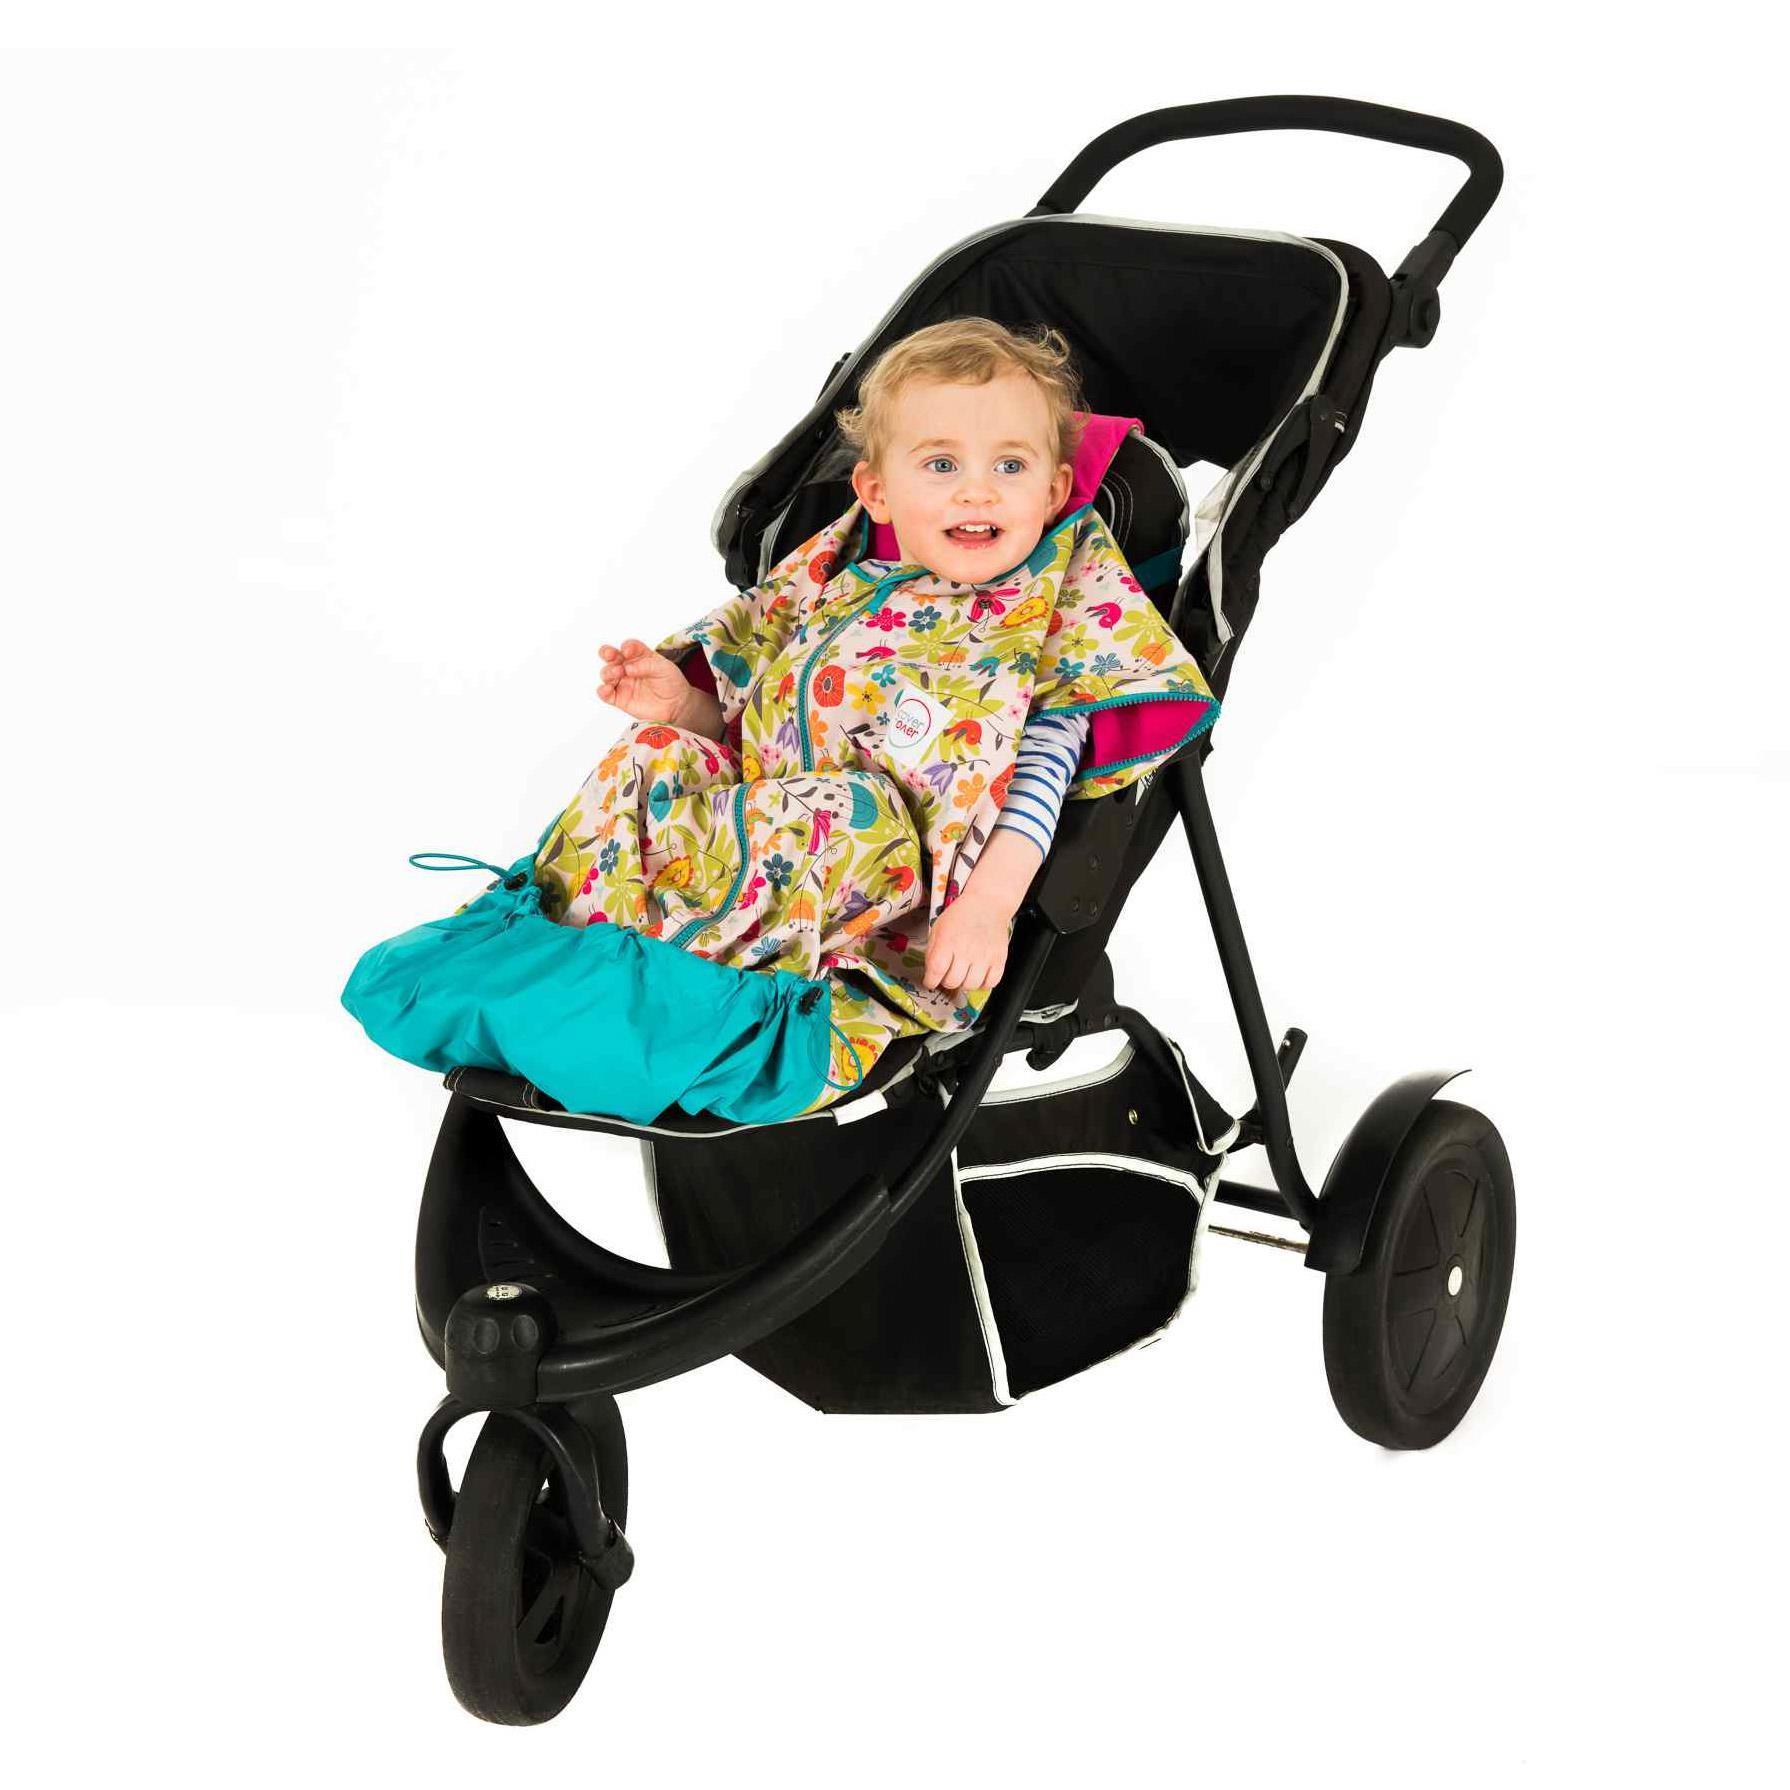 Coverover Active Comfort - uniwersalne okrycie dla dzieci